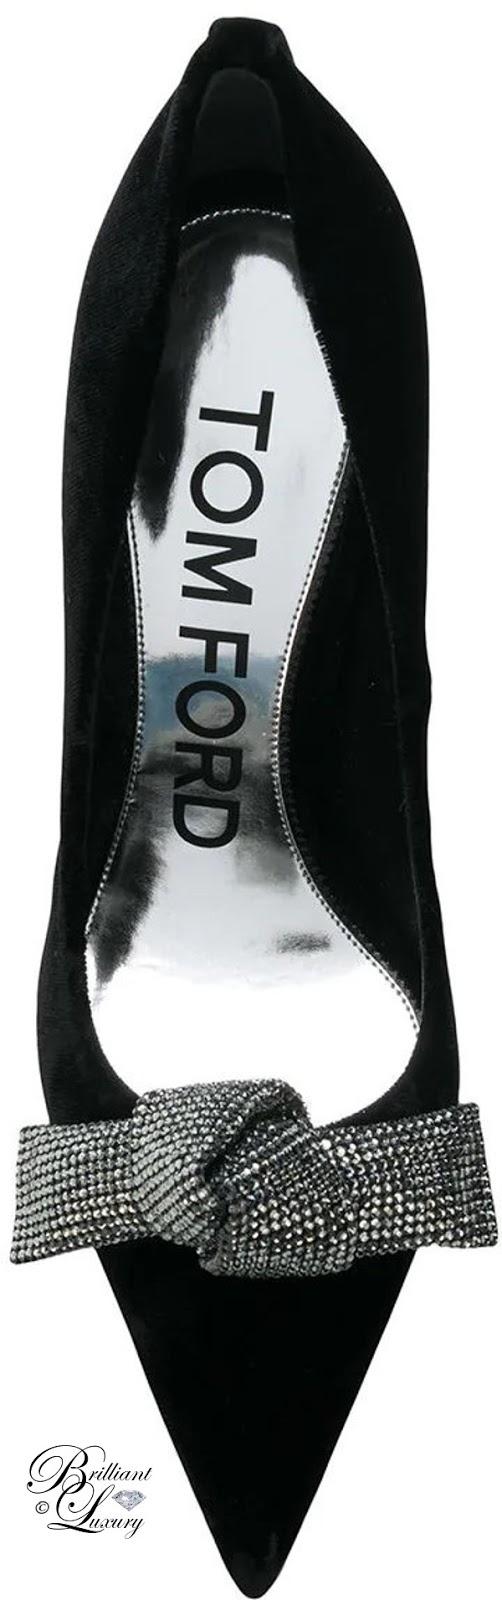 Brilliant Luxury ♦ Tom Ford embellished bow detail pumps #black